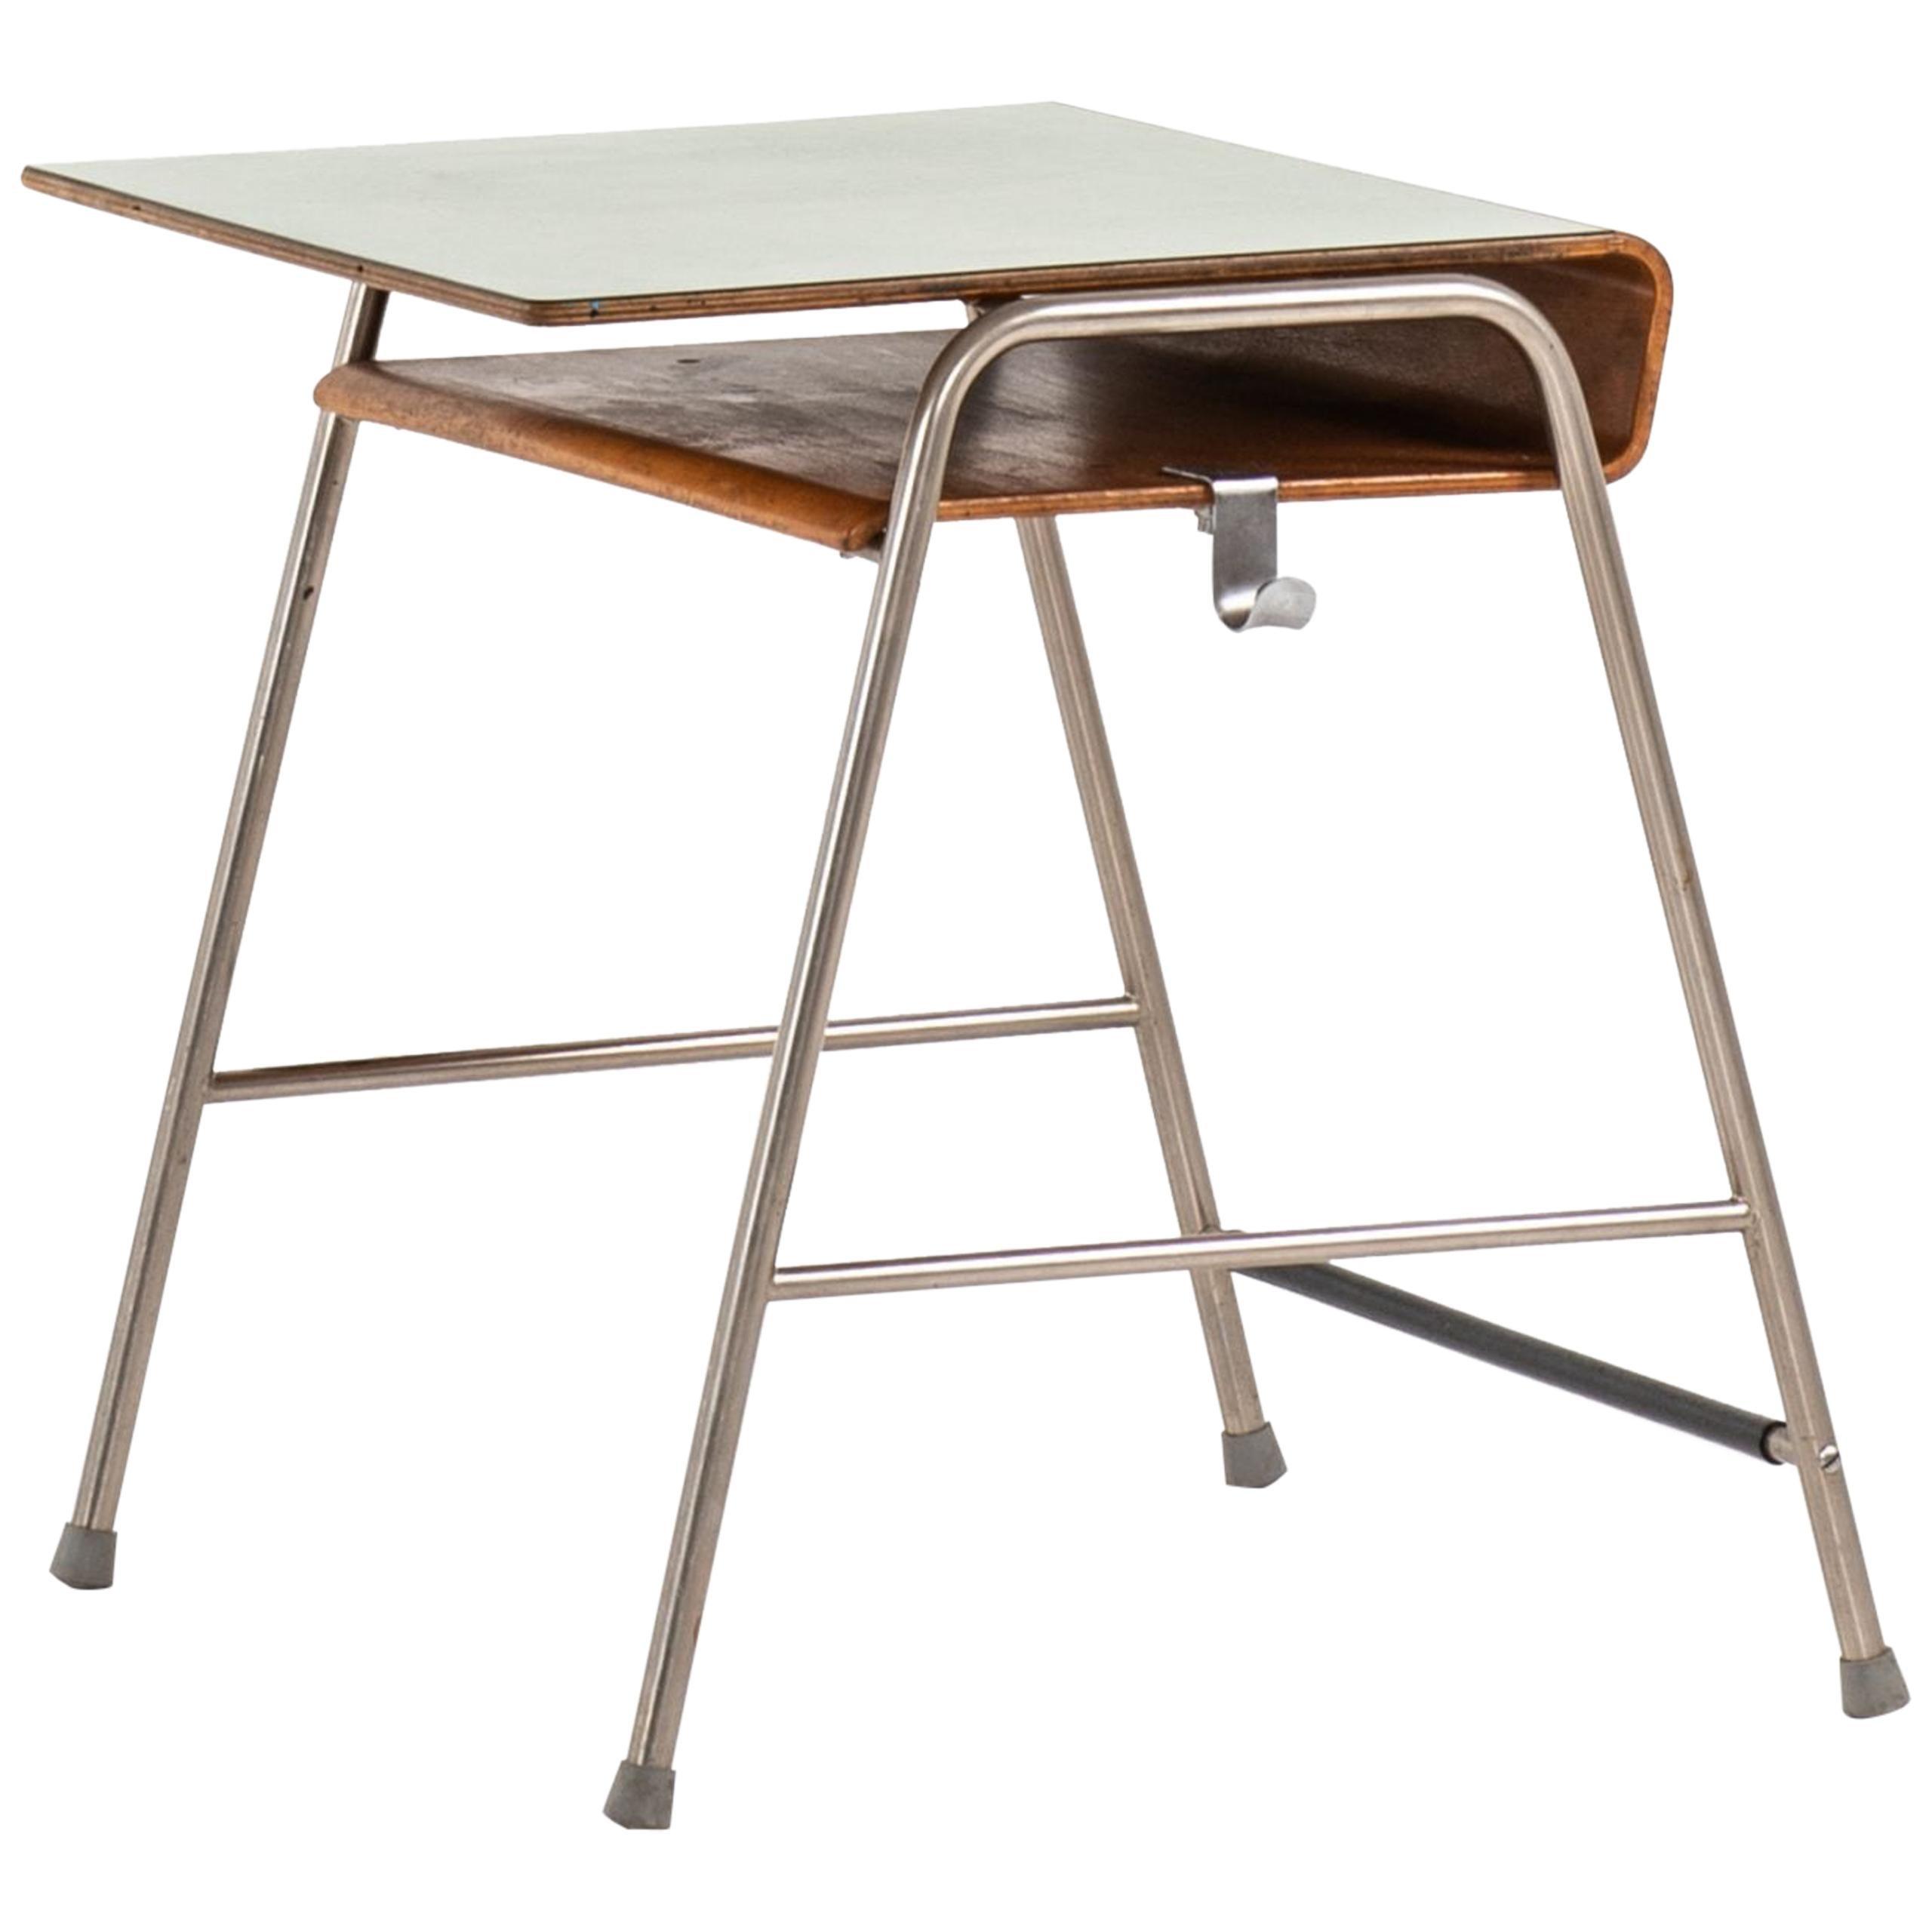 Arne Jacobsen Munkegaard School Desk Produced by Fritz Hansen in Denmark